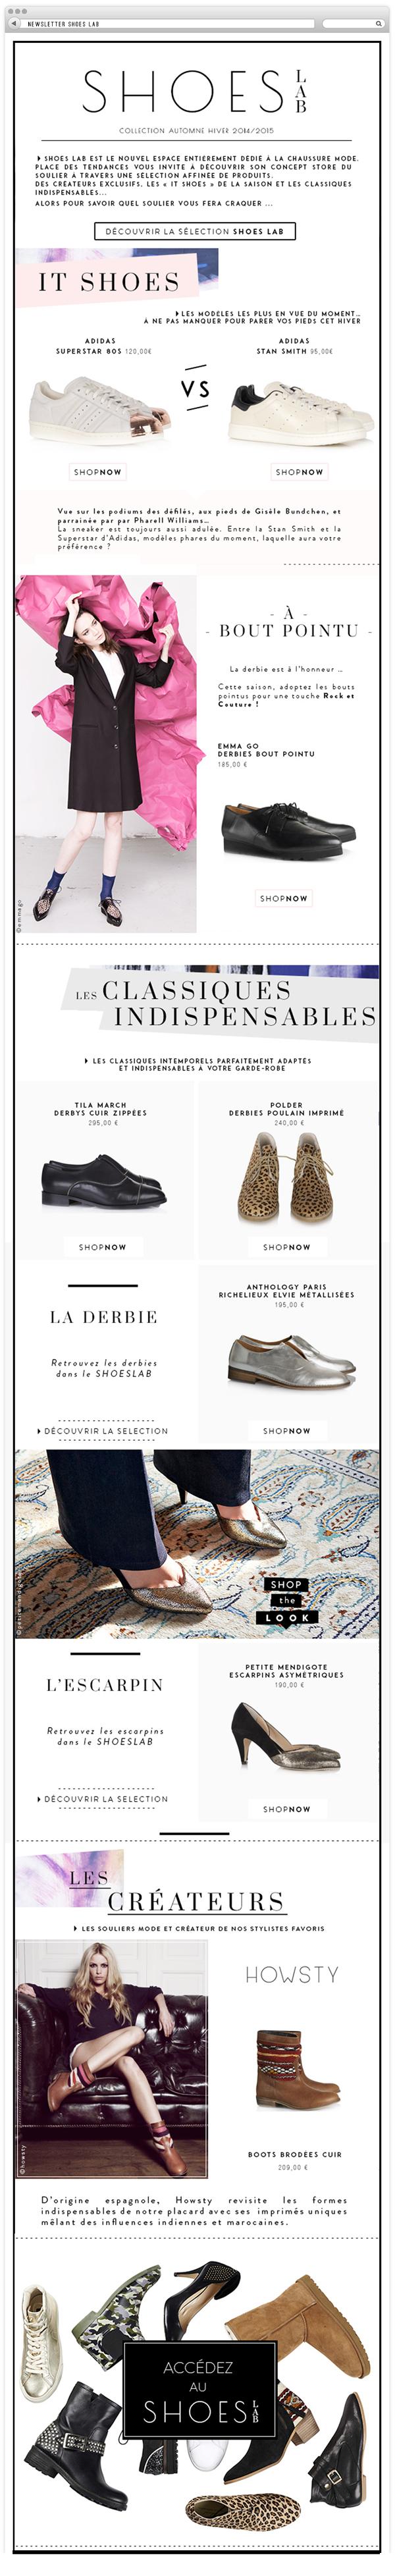 shoeslab-newsletter-studiodoux